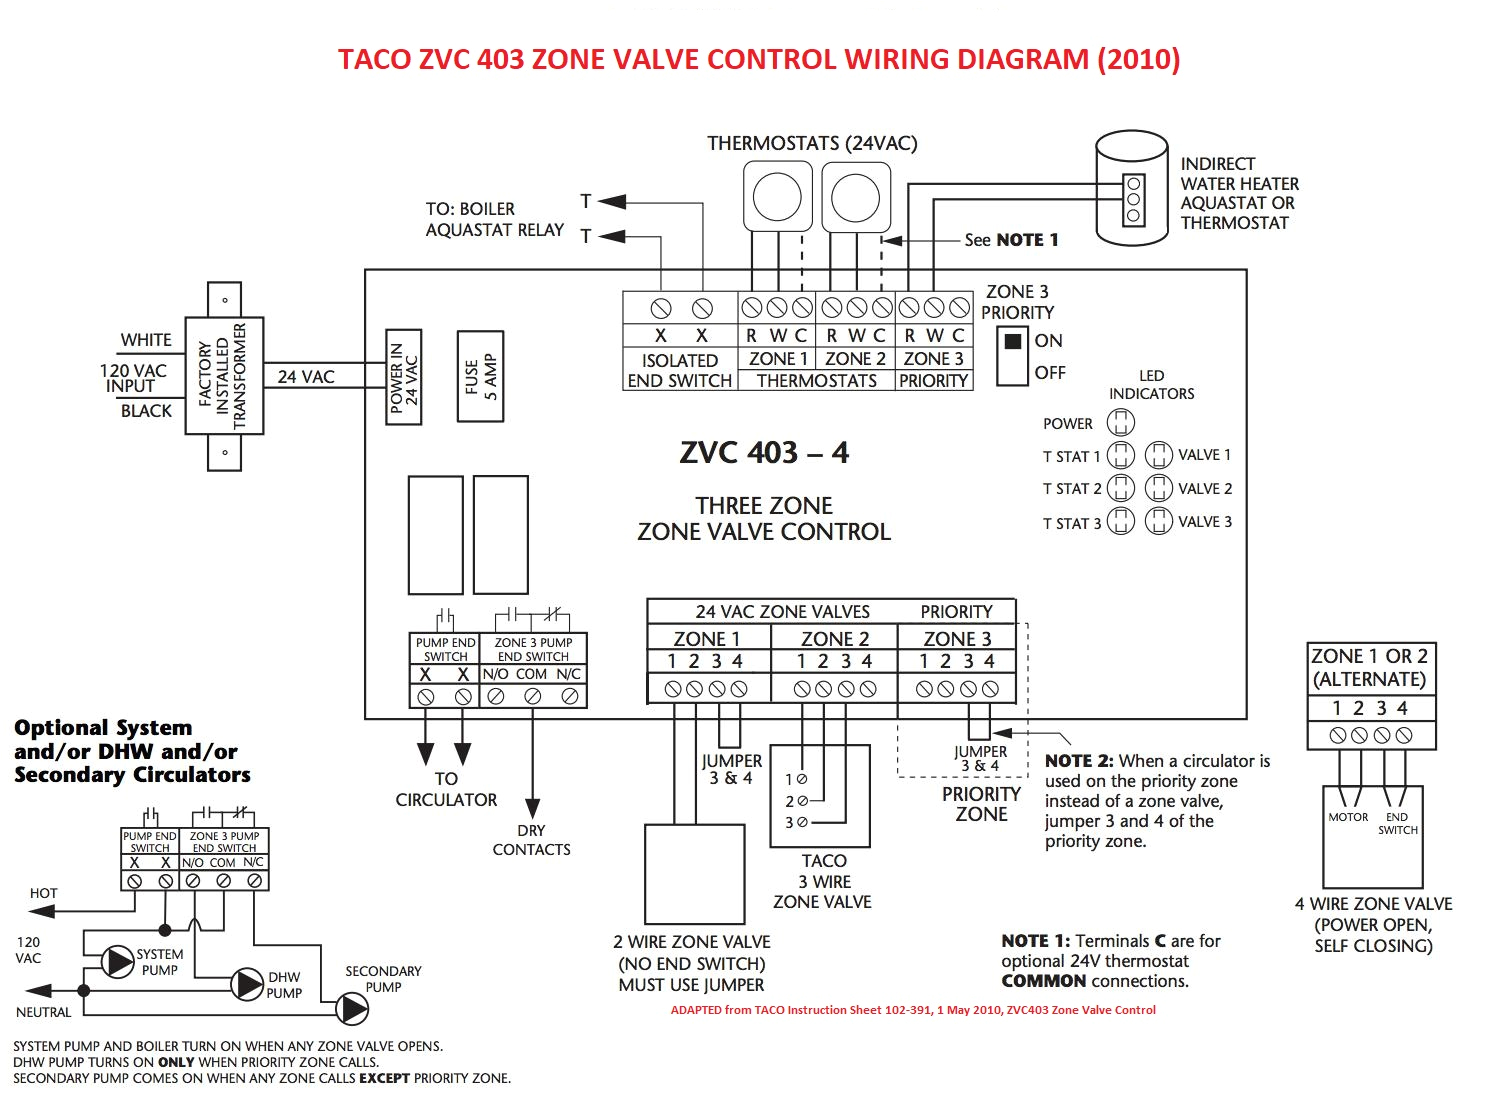 zone valve wiring installation instructions guide to heating 4 wire zone valve diagram 4 wire zone valve diagram